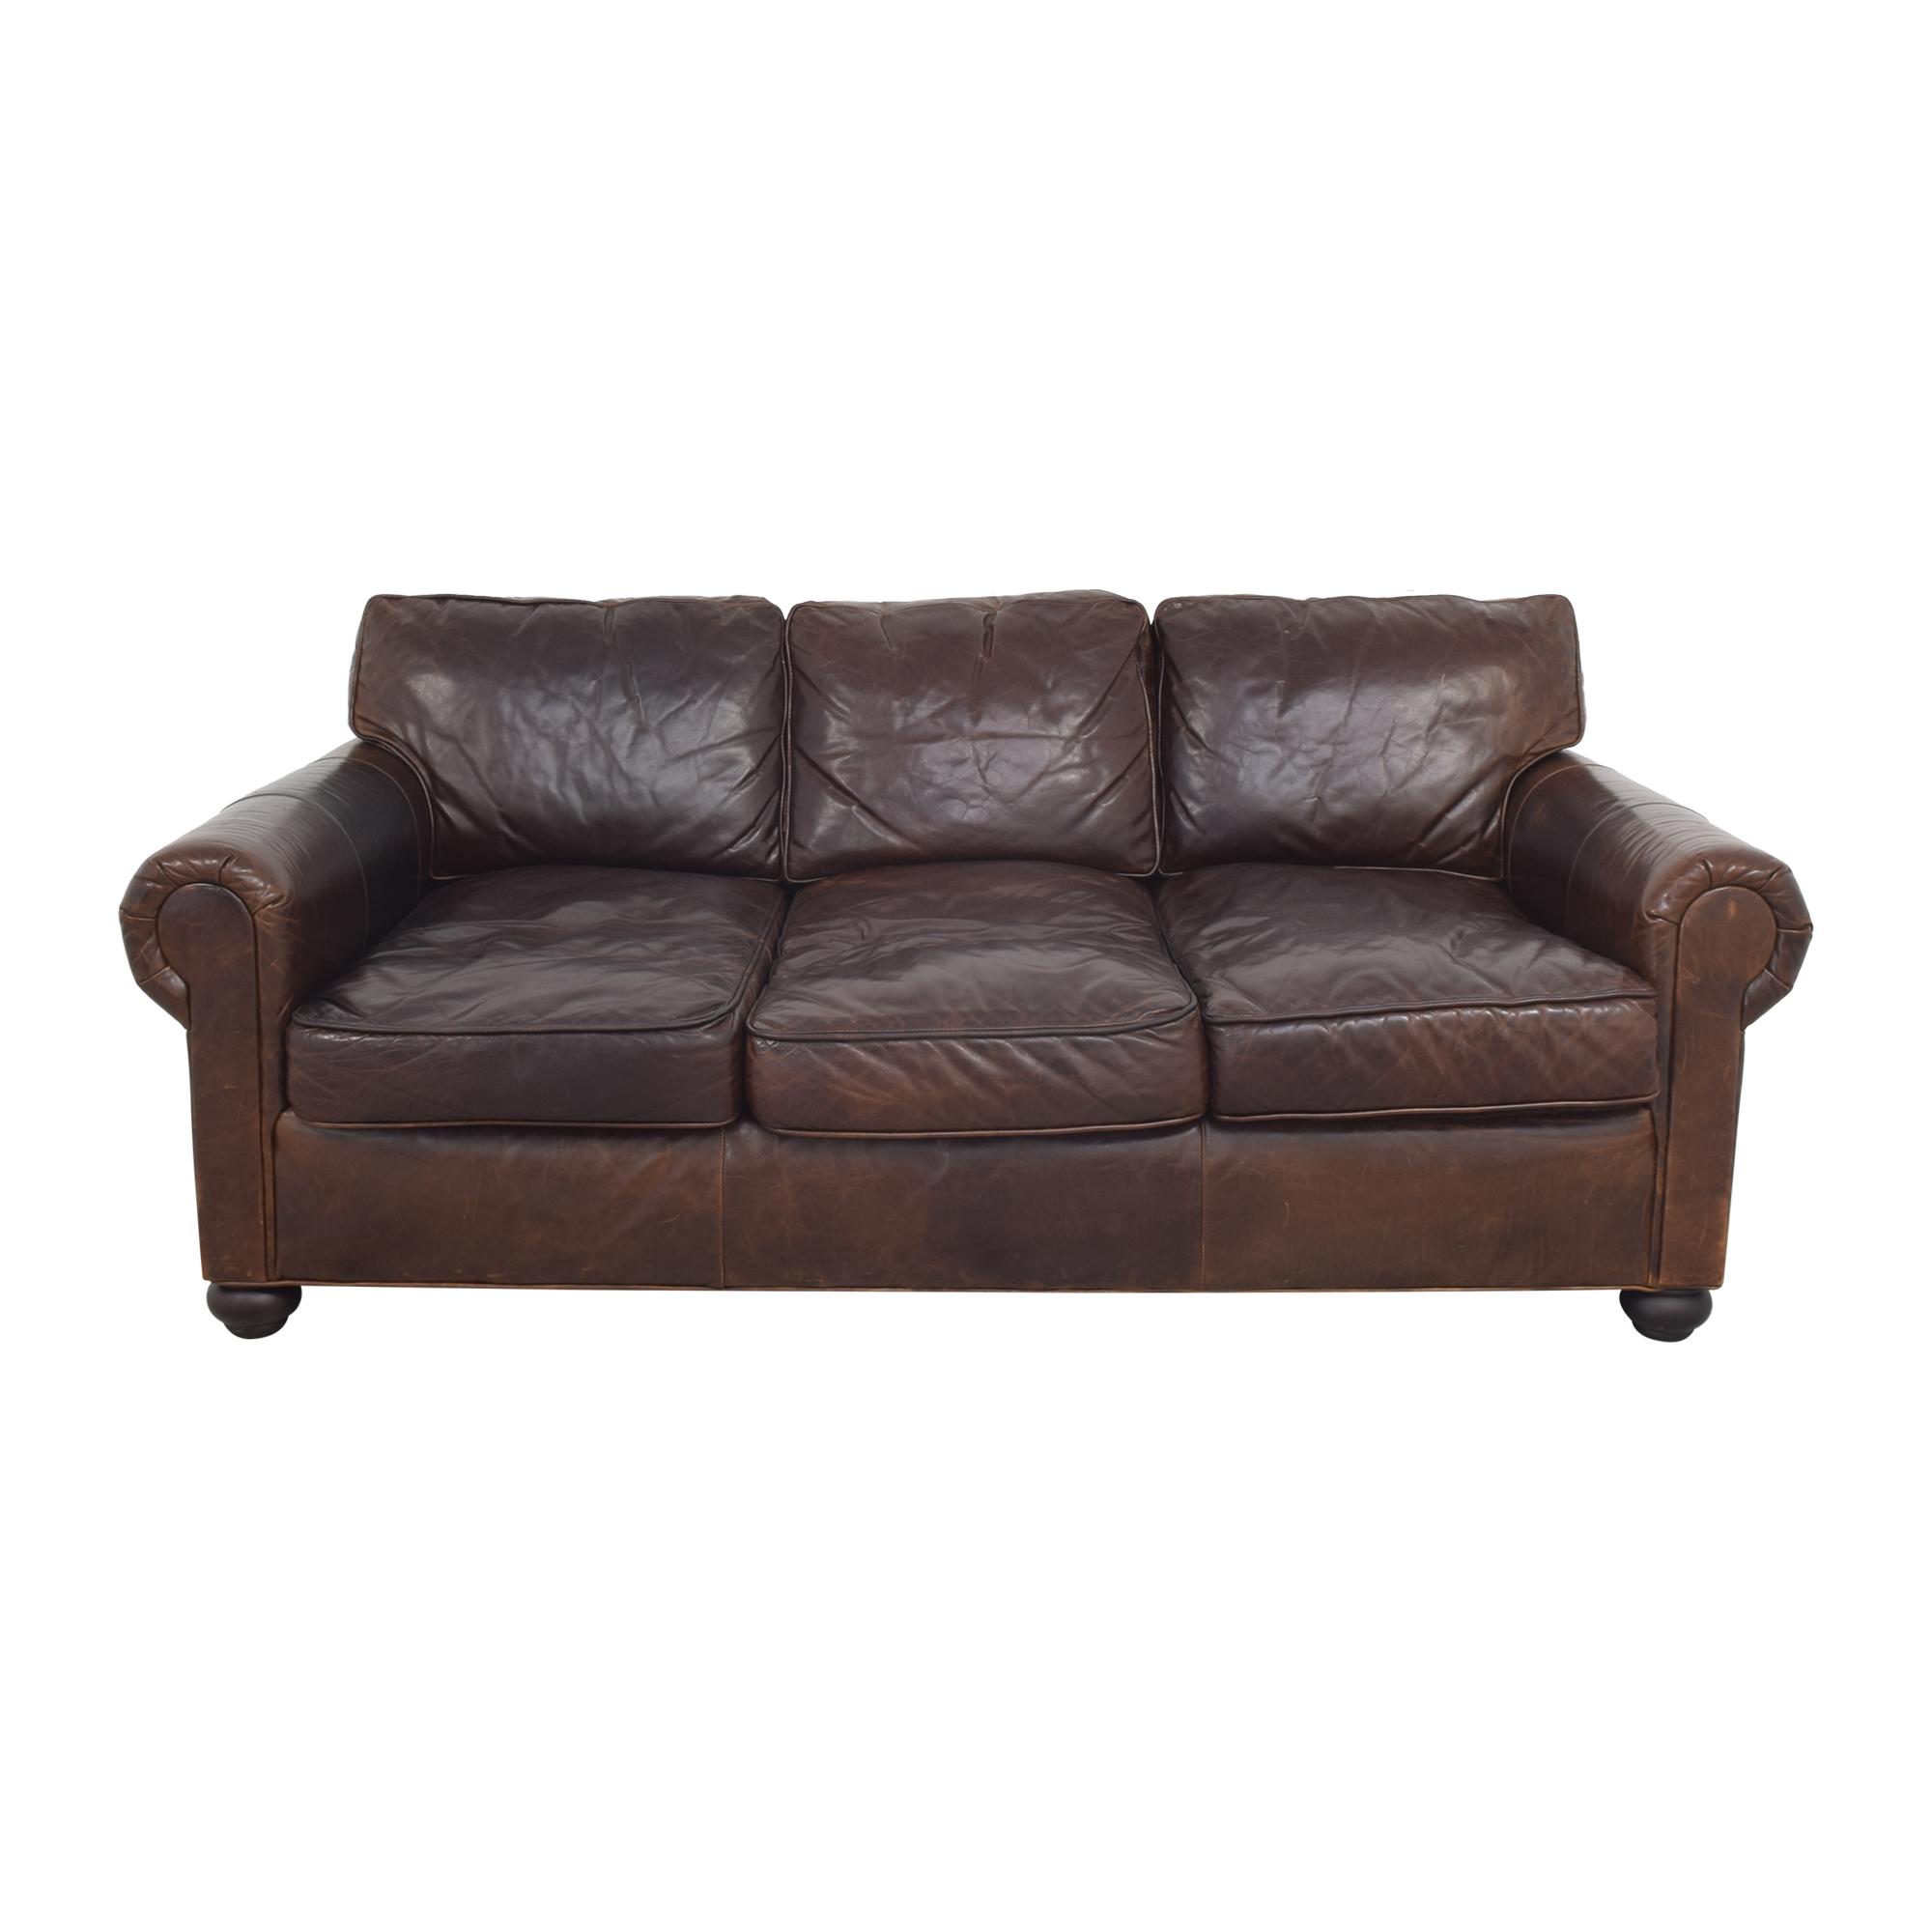 Restoration Hardware Original Lancaster Sofa / Sofas